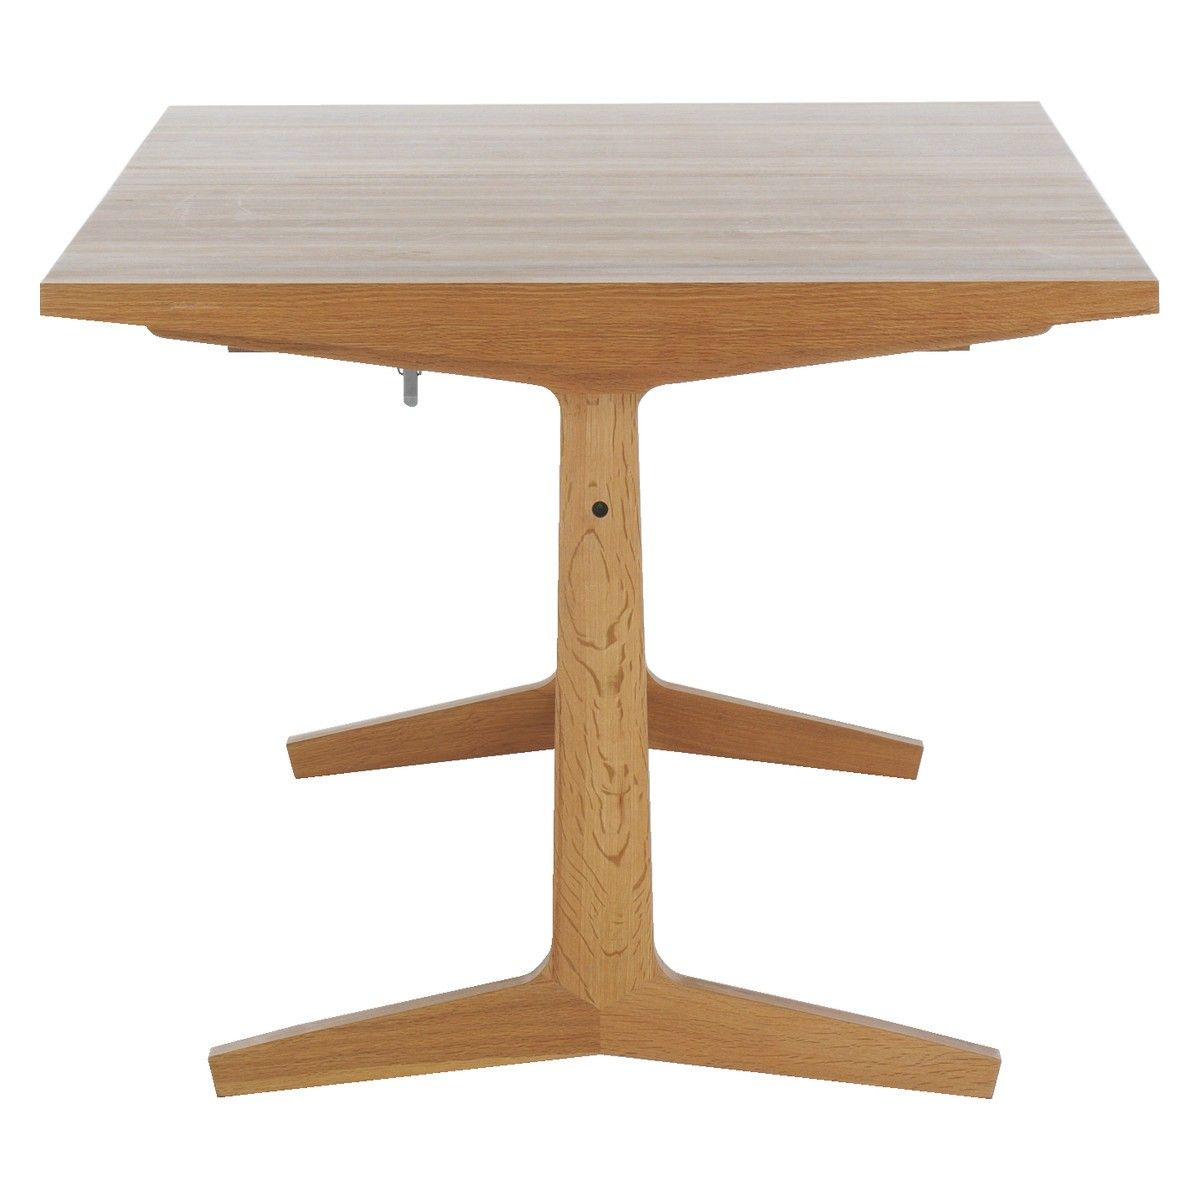 Habitat Parker 8 10 Seat Oak Extending Dining Table W100 X